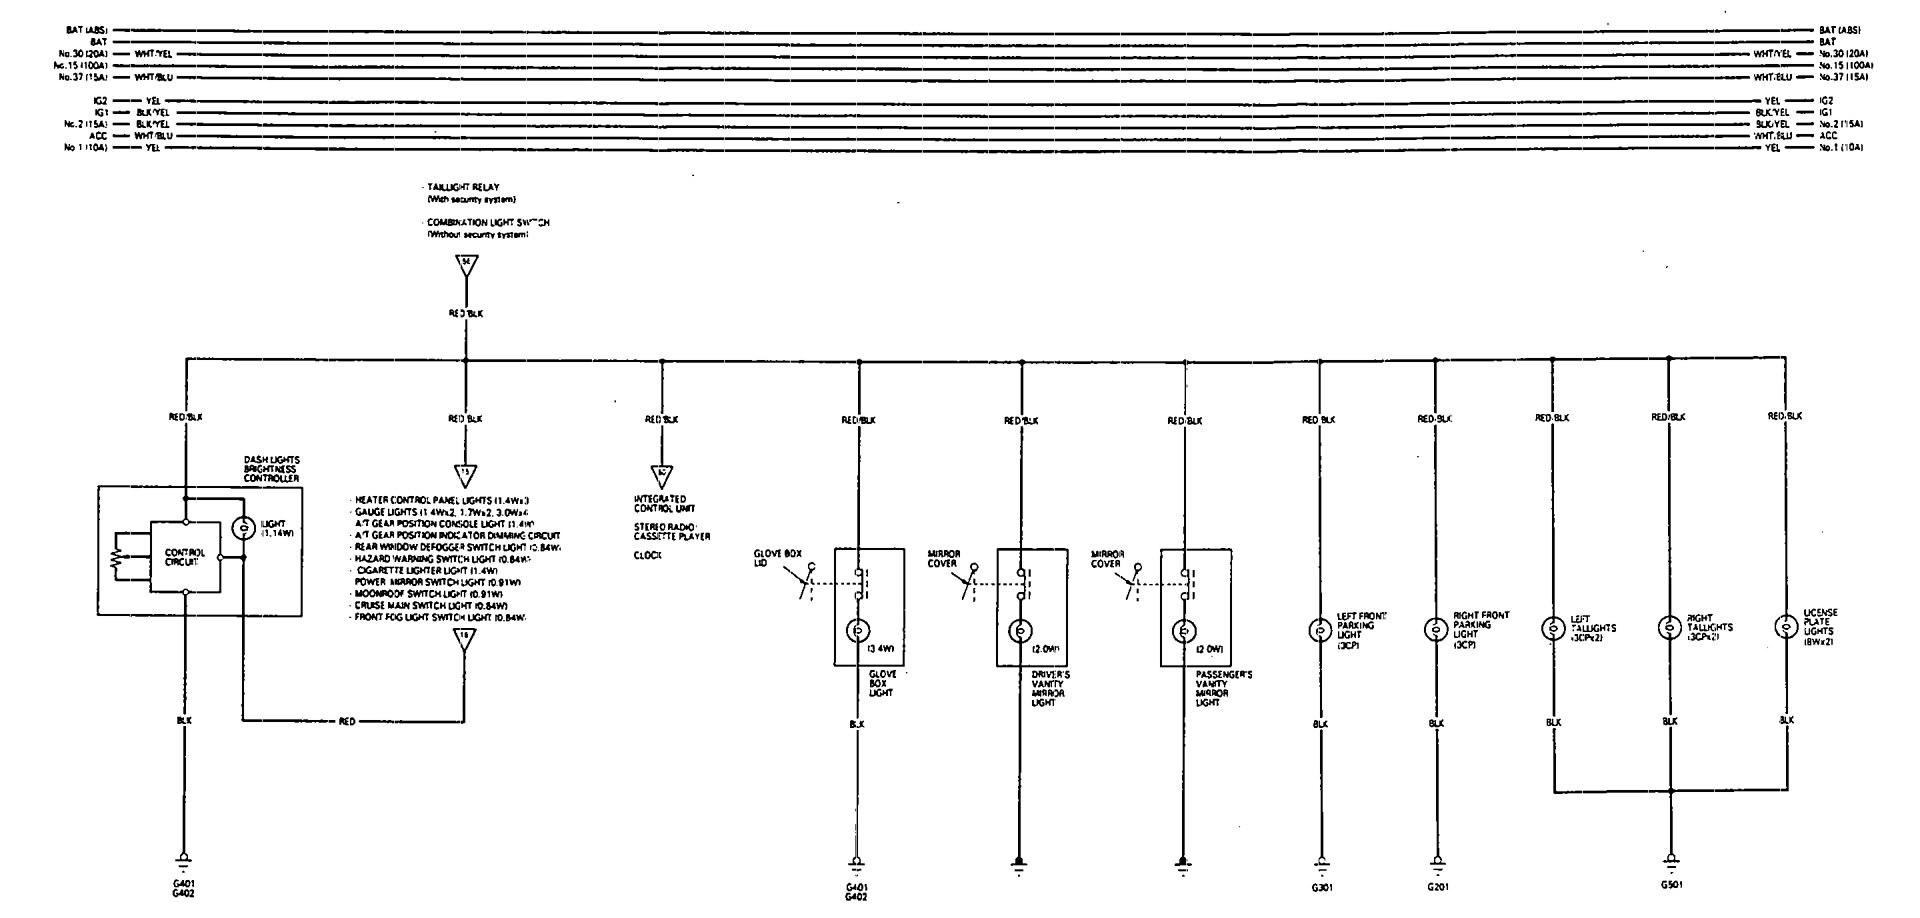 parking circuit wiring diagram acura vigor  1994  wiring diagrams parking lamp carknowledge  acura vigor  1994  wiring diagrams